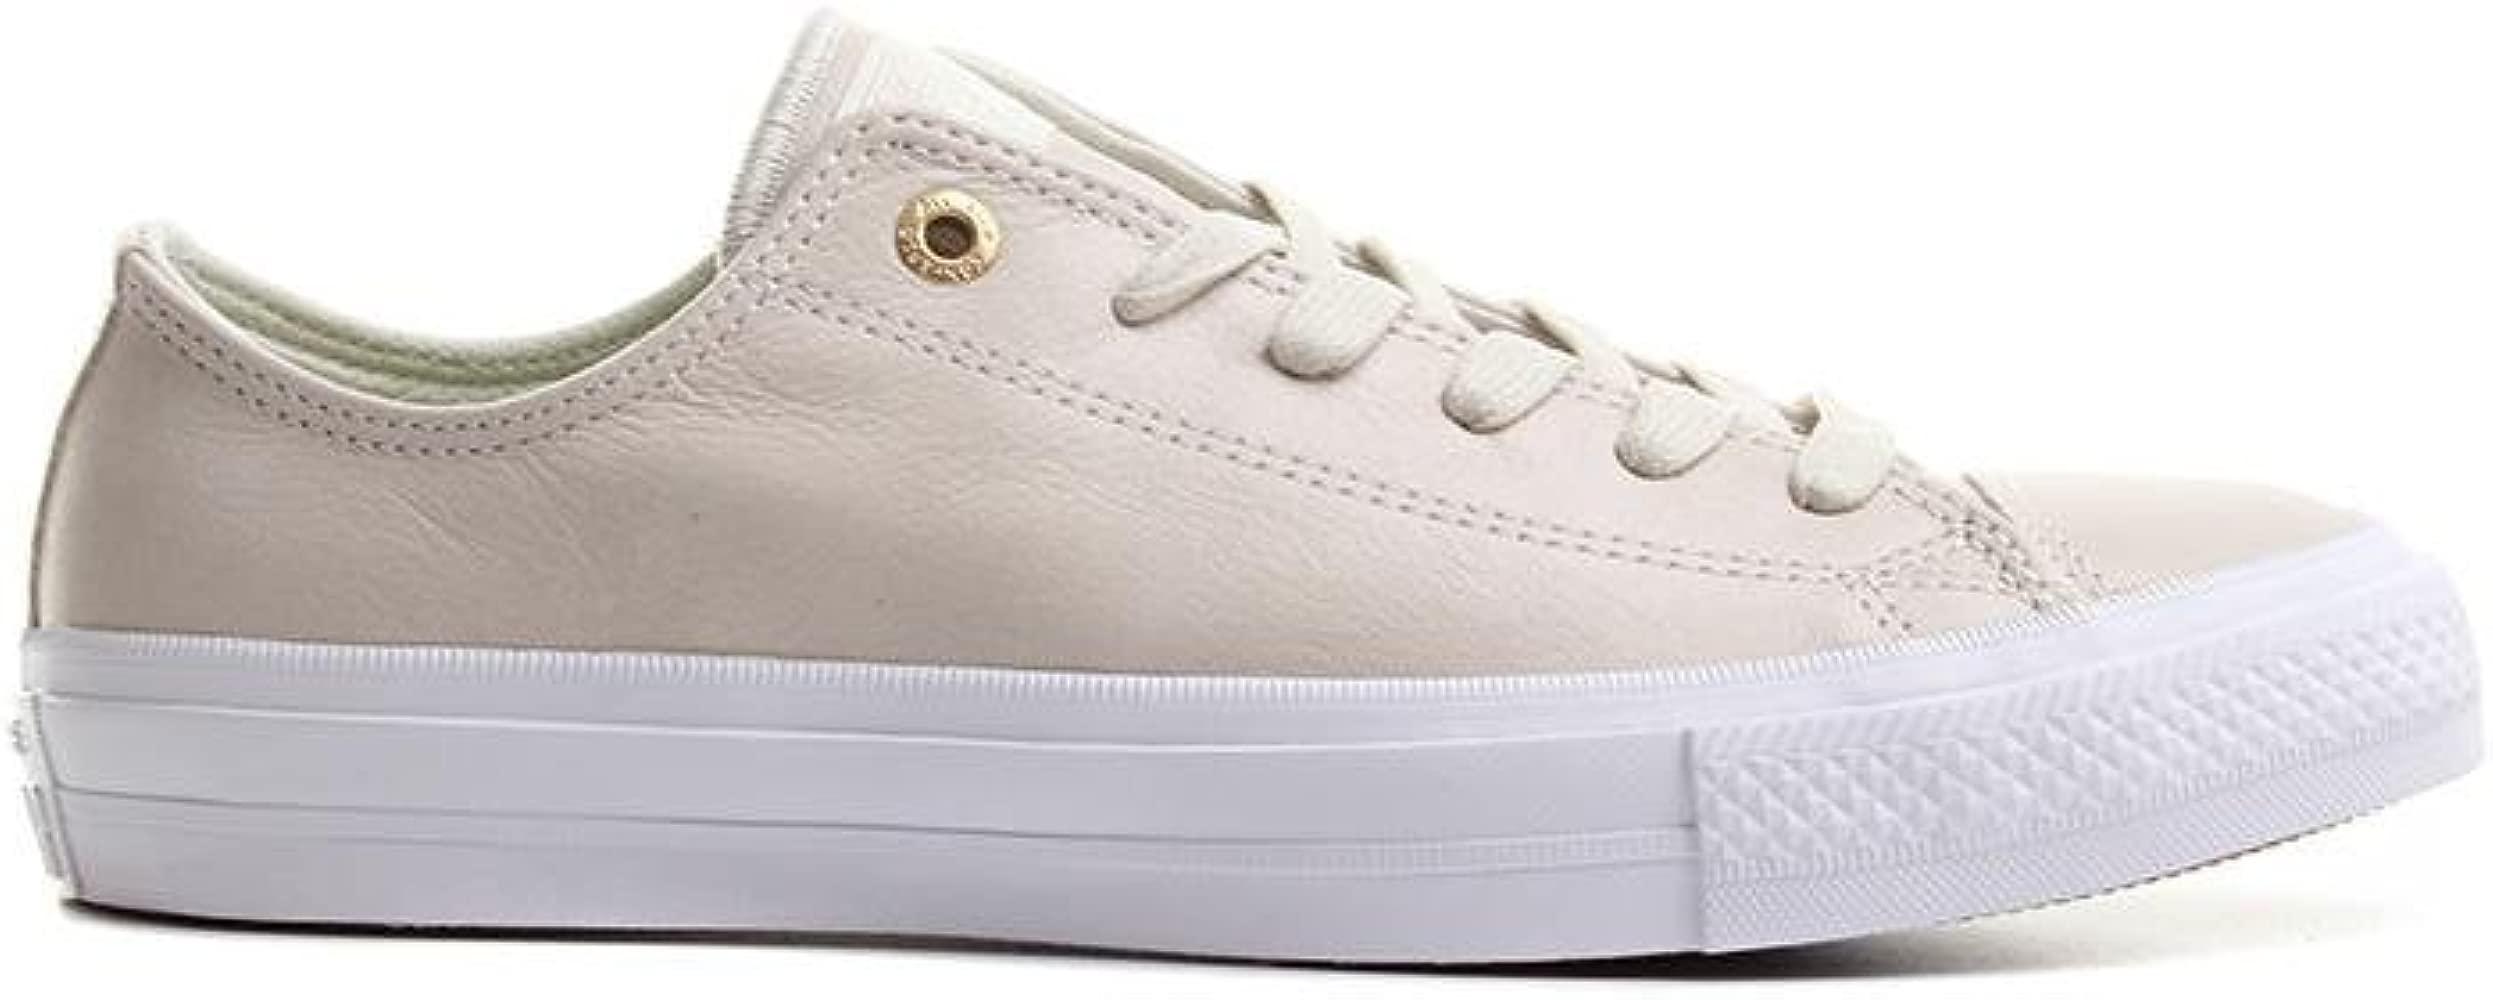 adidas Chuck Taylor All Star II Craft OX, Zapatillas de Baloncesto ...